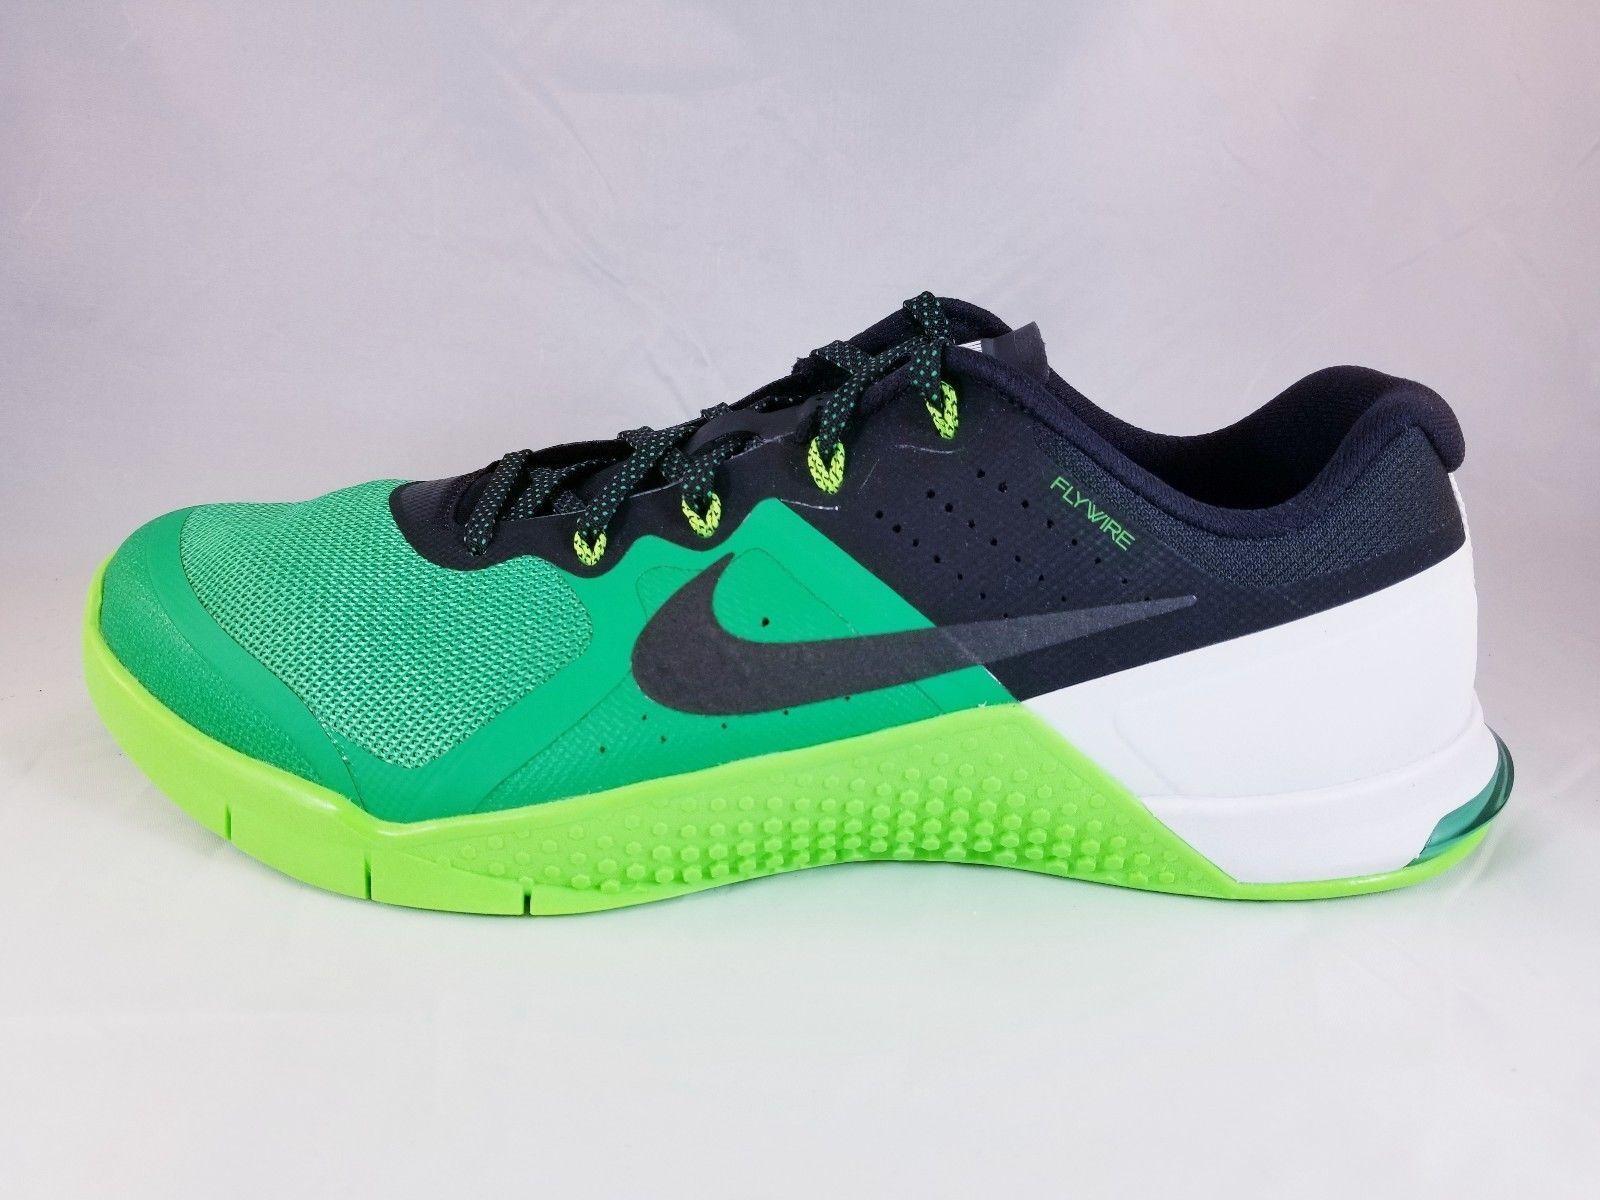 0725f1a1dd0c8 Nike Metcon 2 Men s Cross Training Training Training Shoe 819899 300 Size  11.5 a0870e